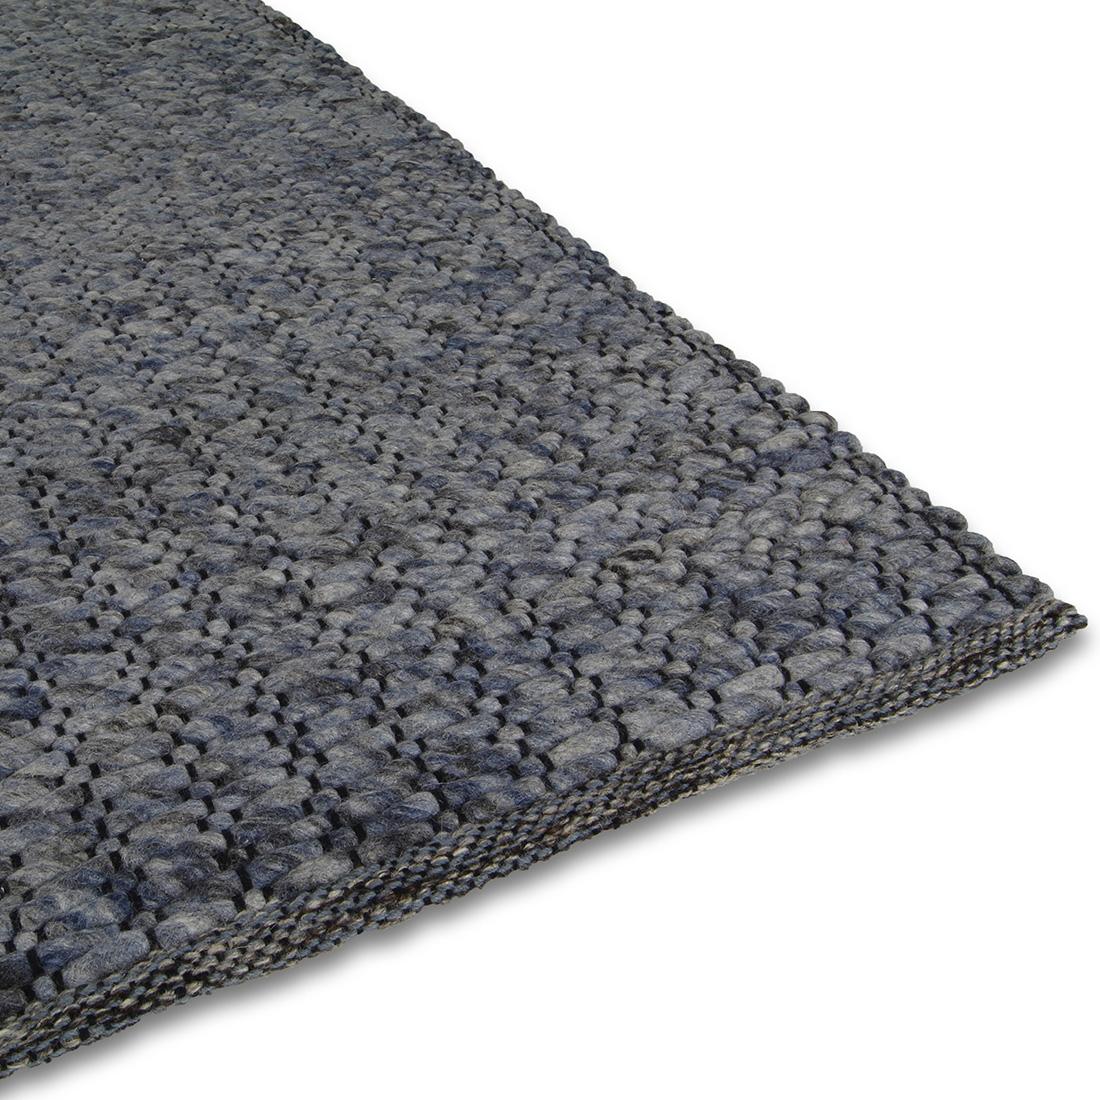 Vloerkleed Brinker Skana Blue | 200 x 300 cm